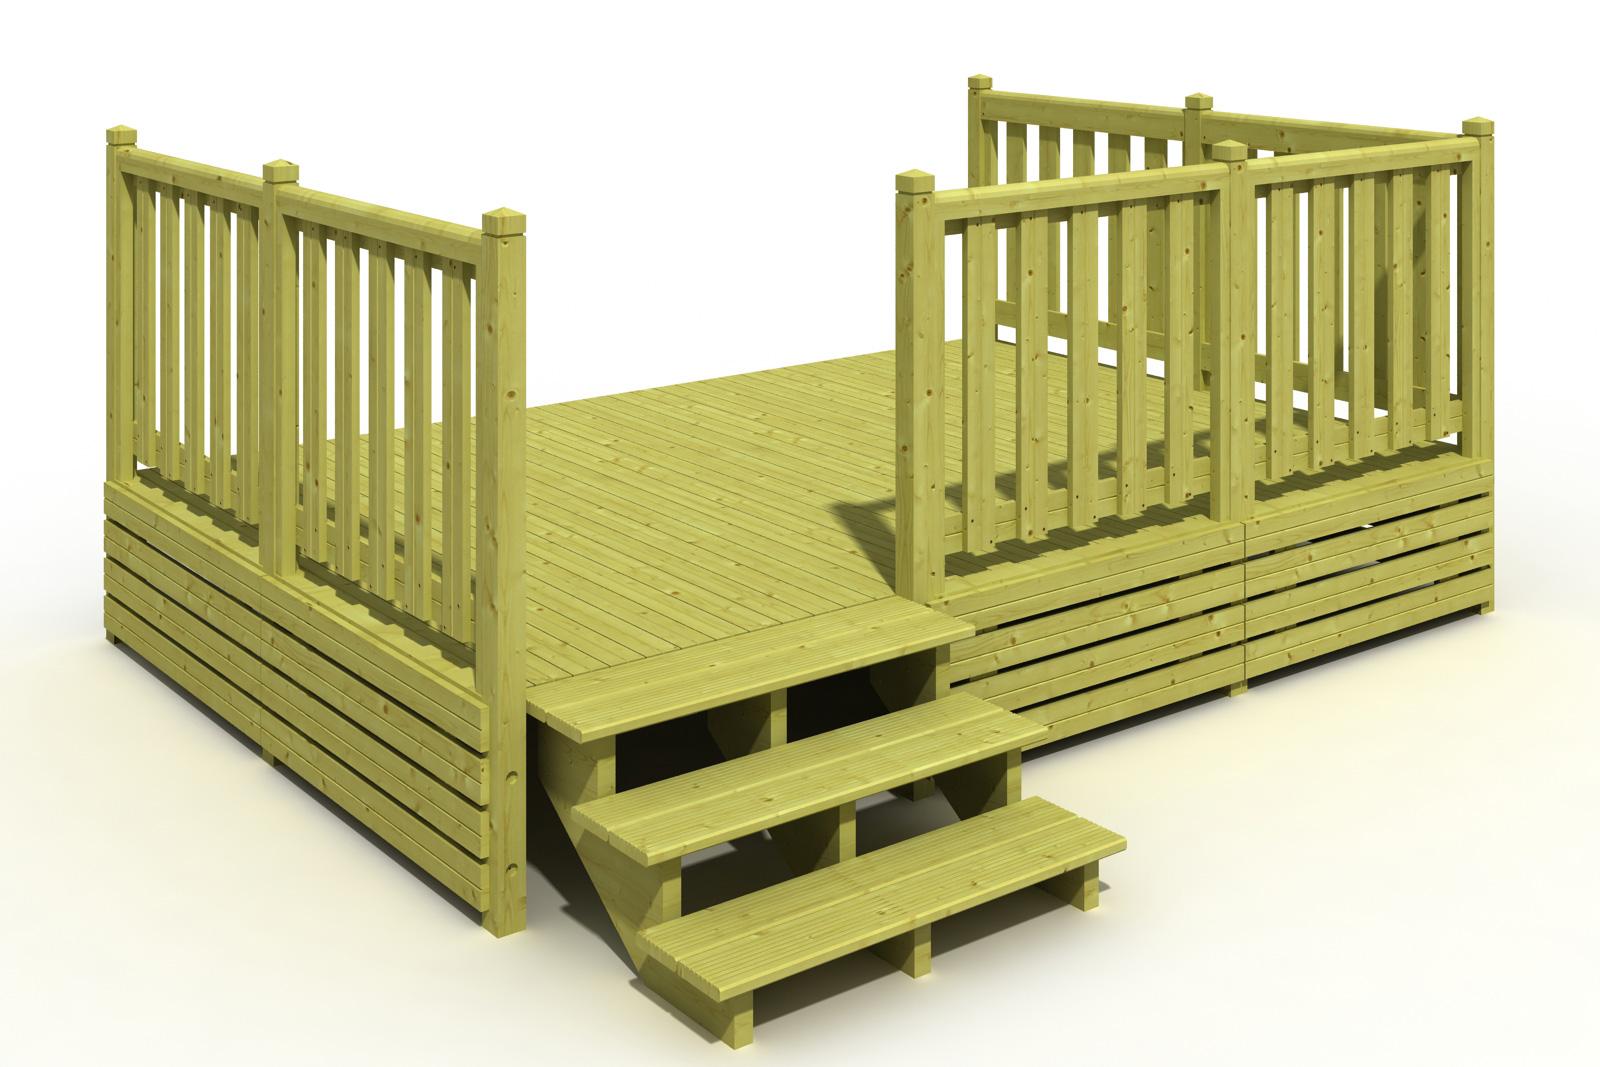 Terrasse Malte 250×360 ou 300×360 Terrasse Mobil Home Deckit Fabricant terrasses en bois  # Fabricant Mobil Home Bois